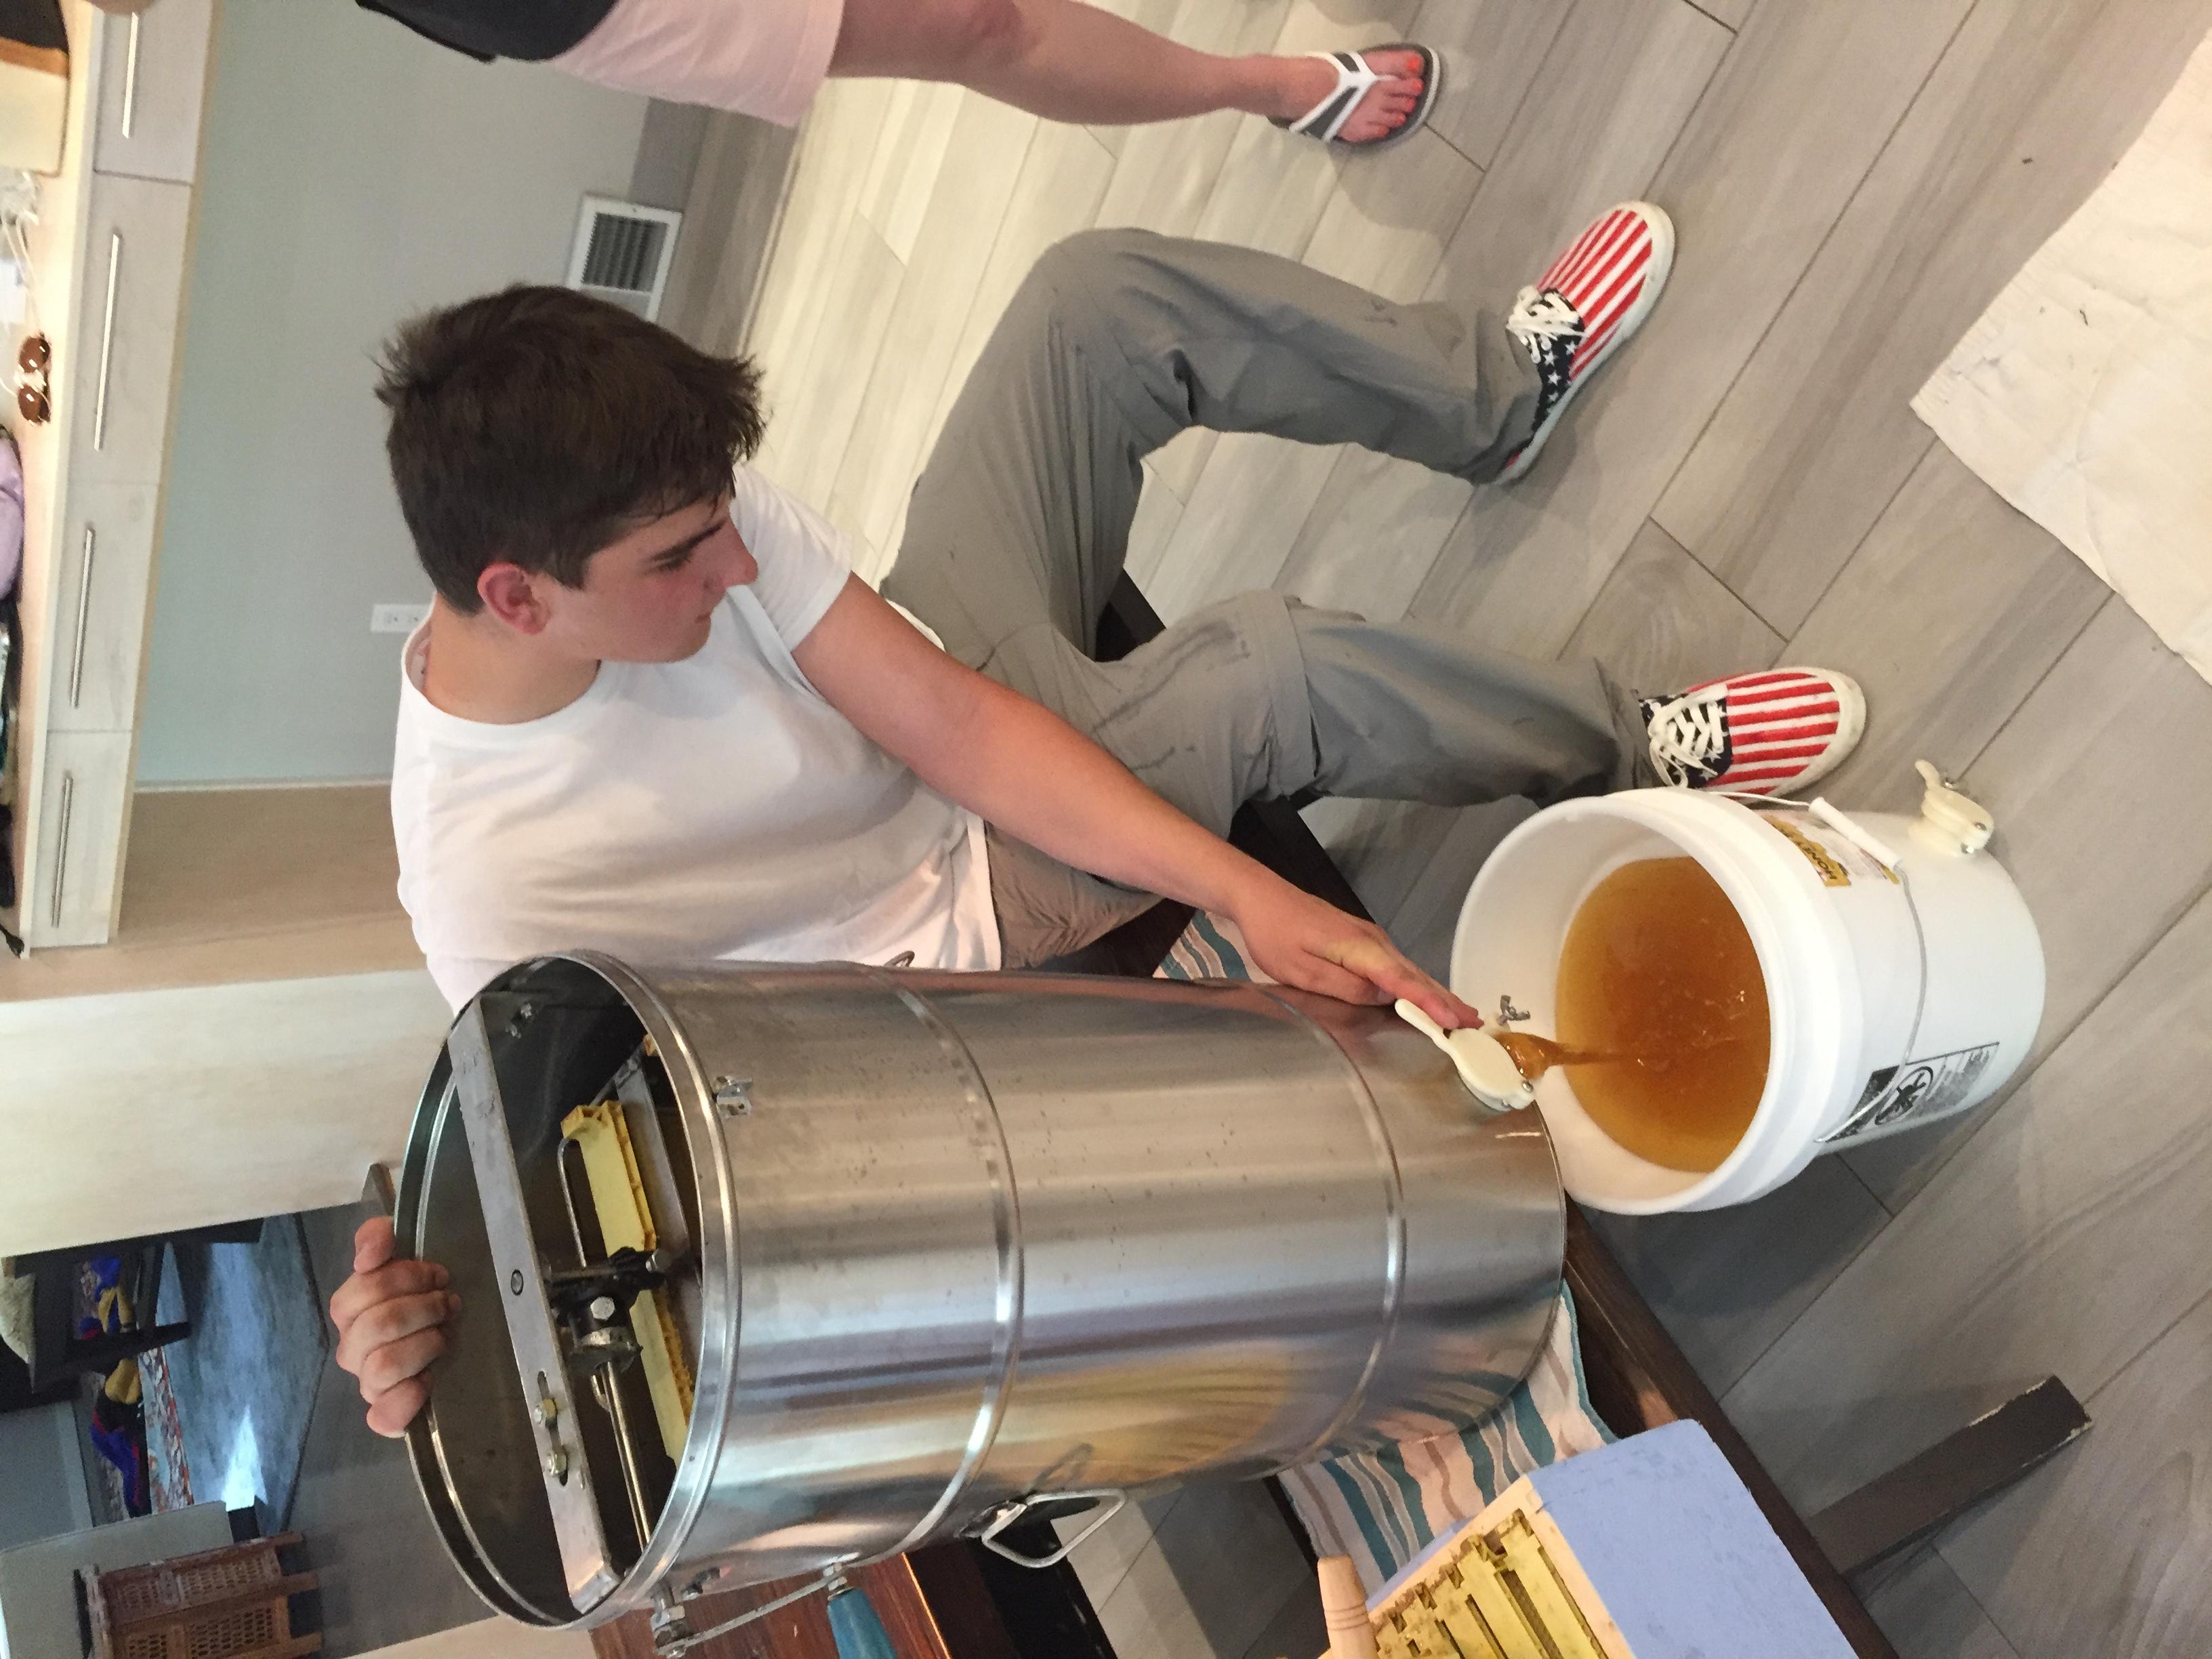 Filtering the honey